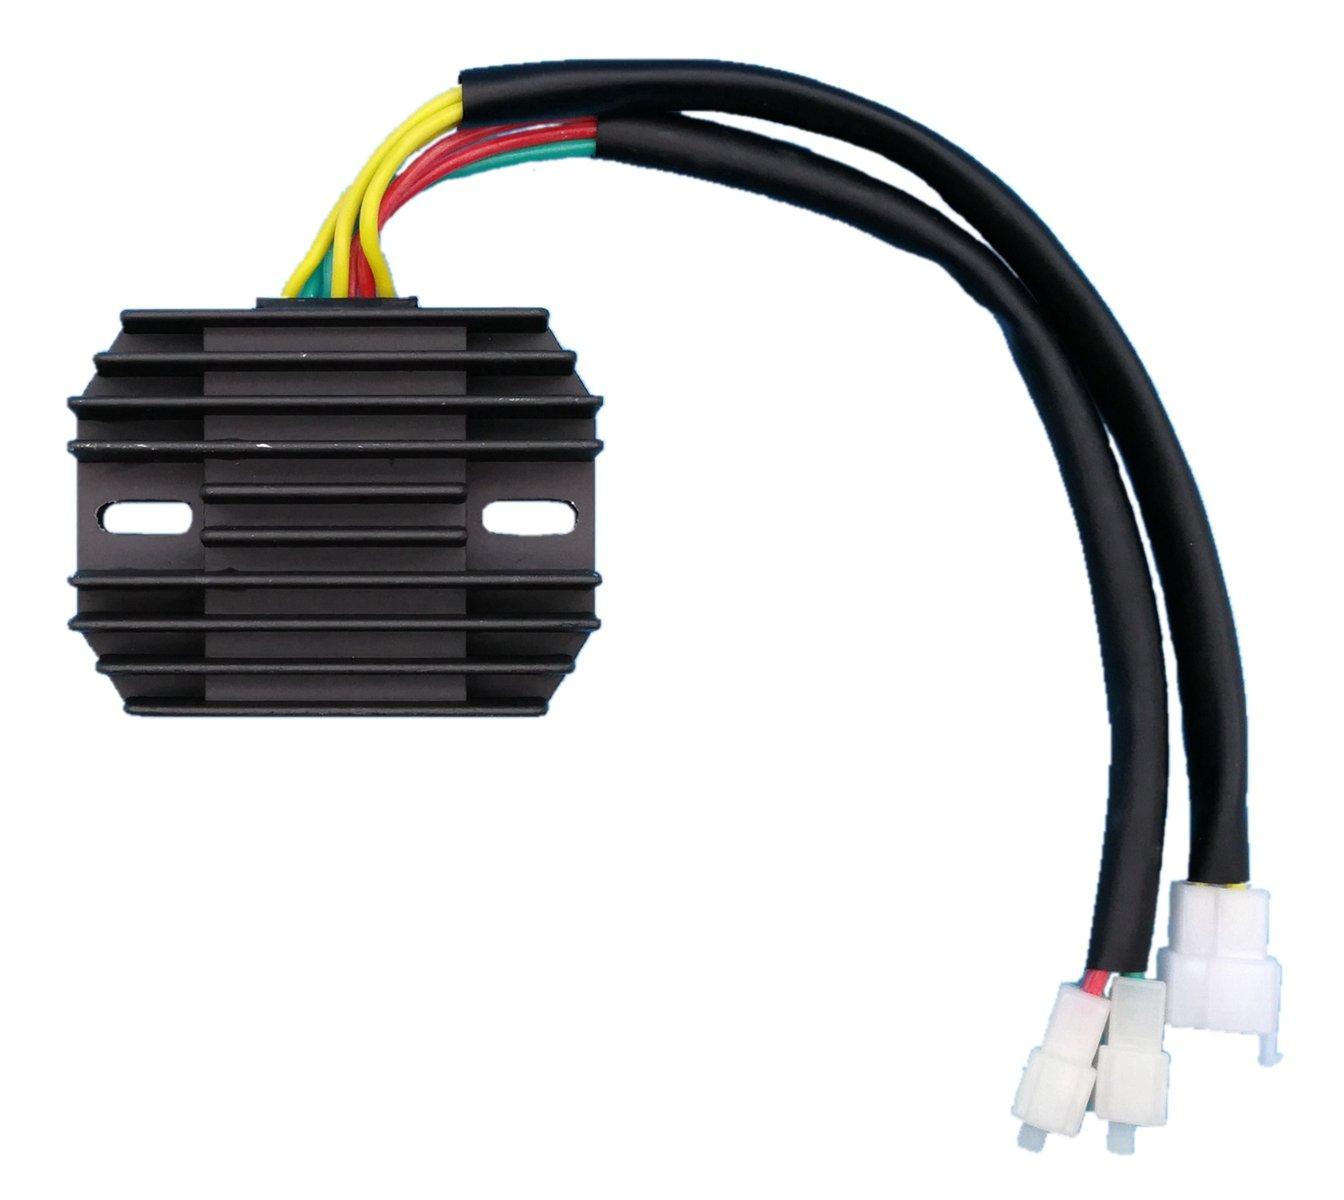 Tuzliufi Voltage Regulator Rectifier Replace Honda VT1100 VT 1100 C3 Aero C2-2 Ace T Tourer C Shadow C2 Sprirt 1987-1990 1991 1992 1993 1994 1995 1996 1997 1998 1999 2000 2001 2002 2003 2004 2005 Z47 Generic 5559109937